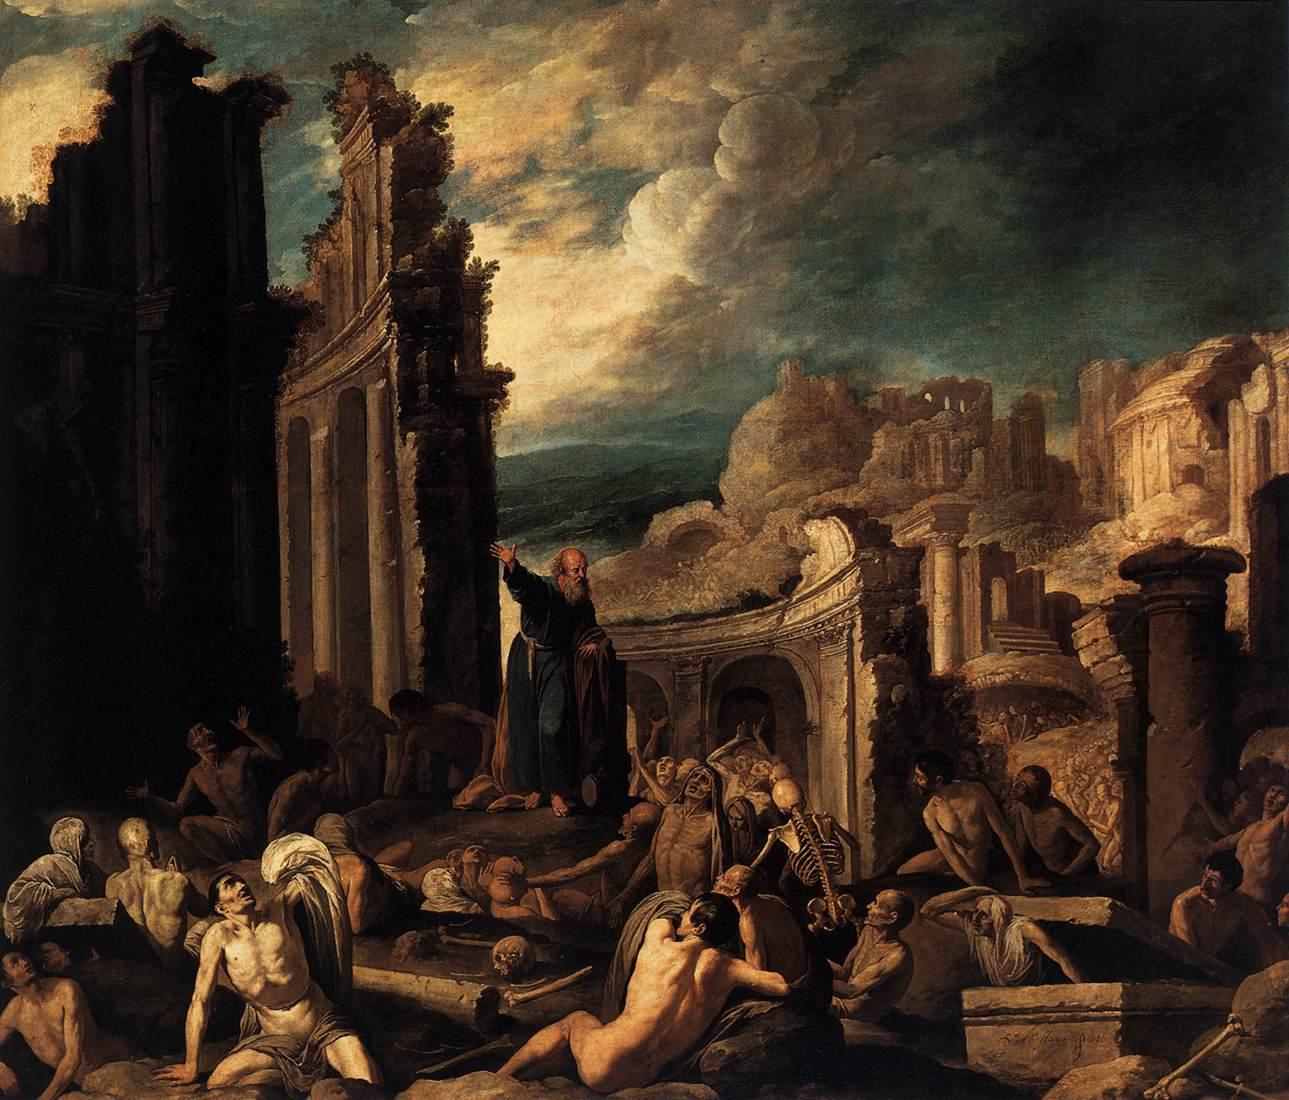 The Vision of Ezekiel - Francisco Collantes (1629)